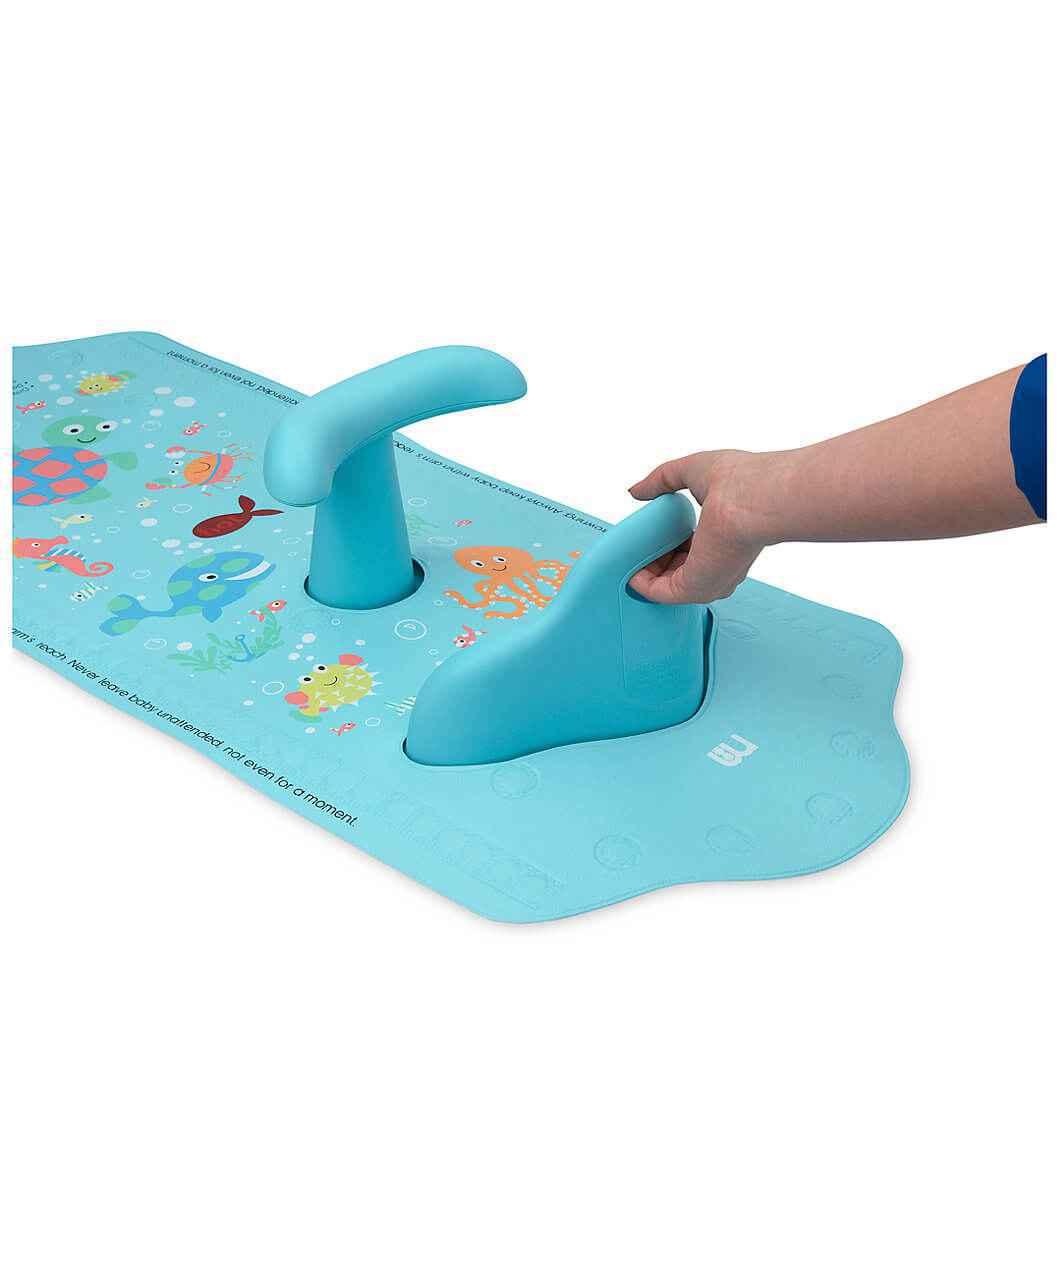 Mothercare Aqua Pod - Blue - GIGEL - 3